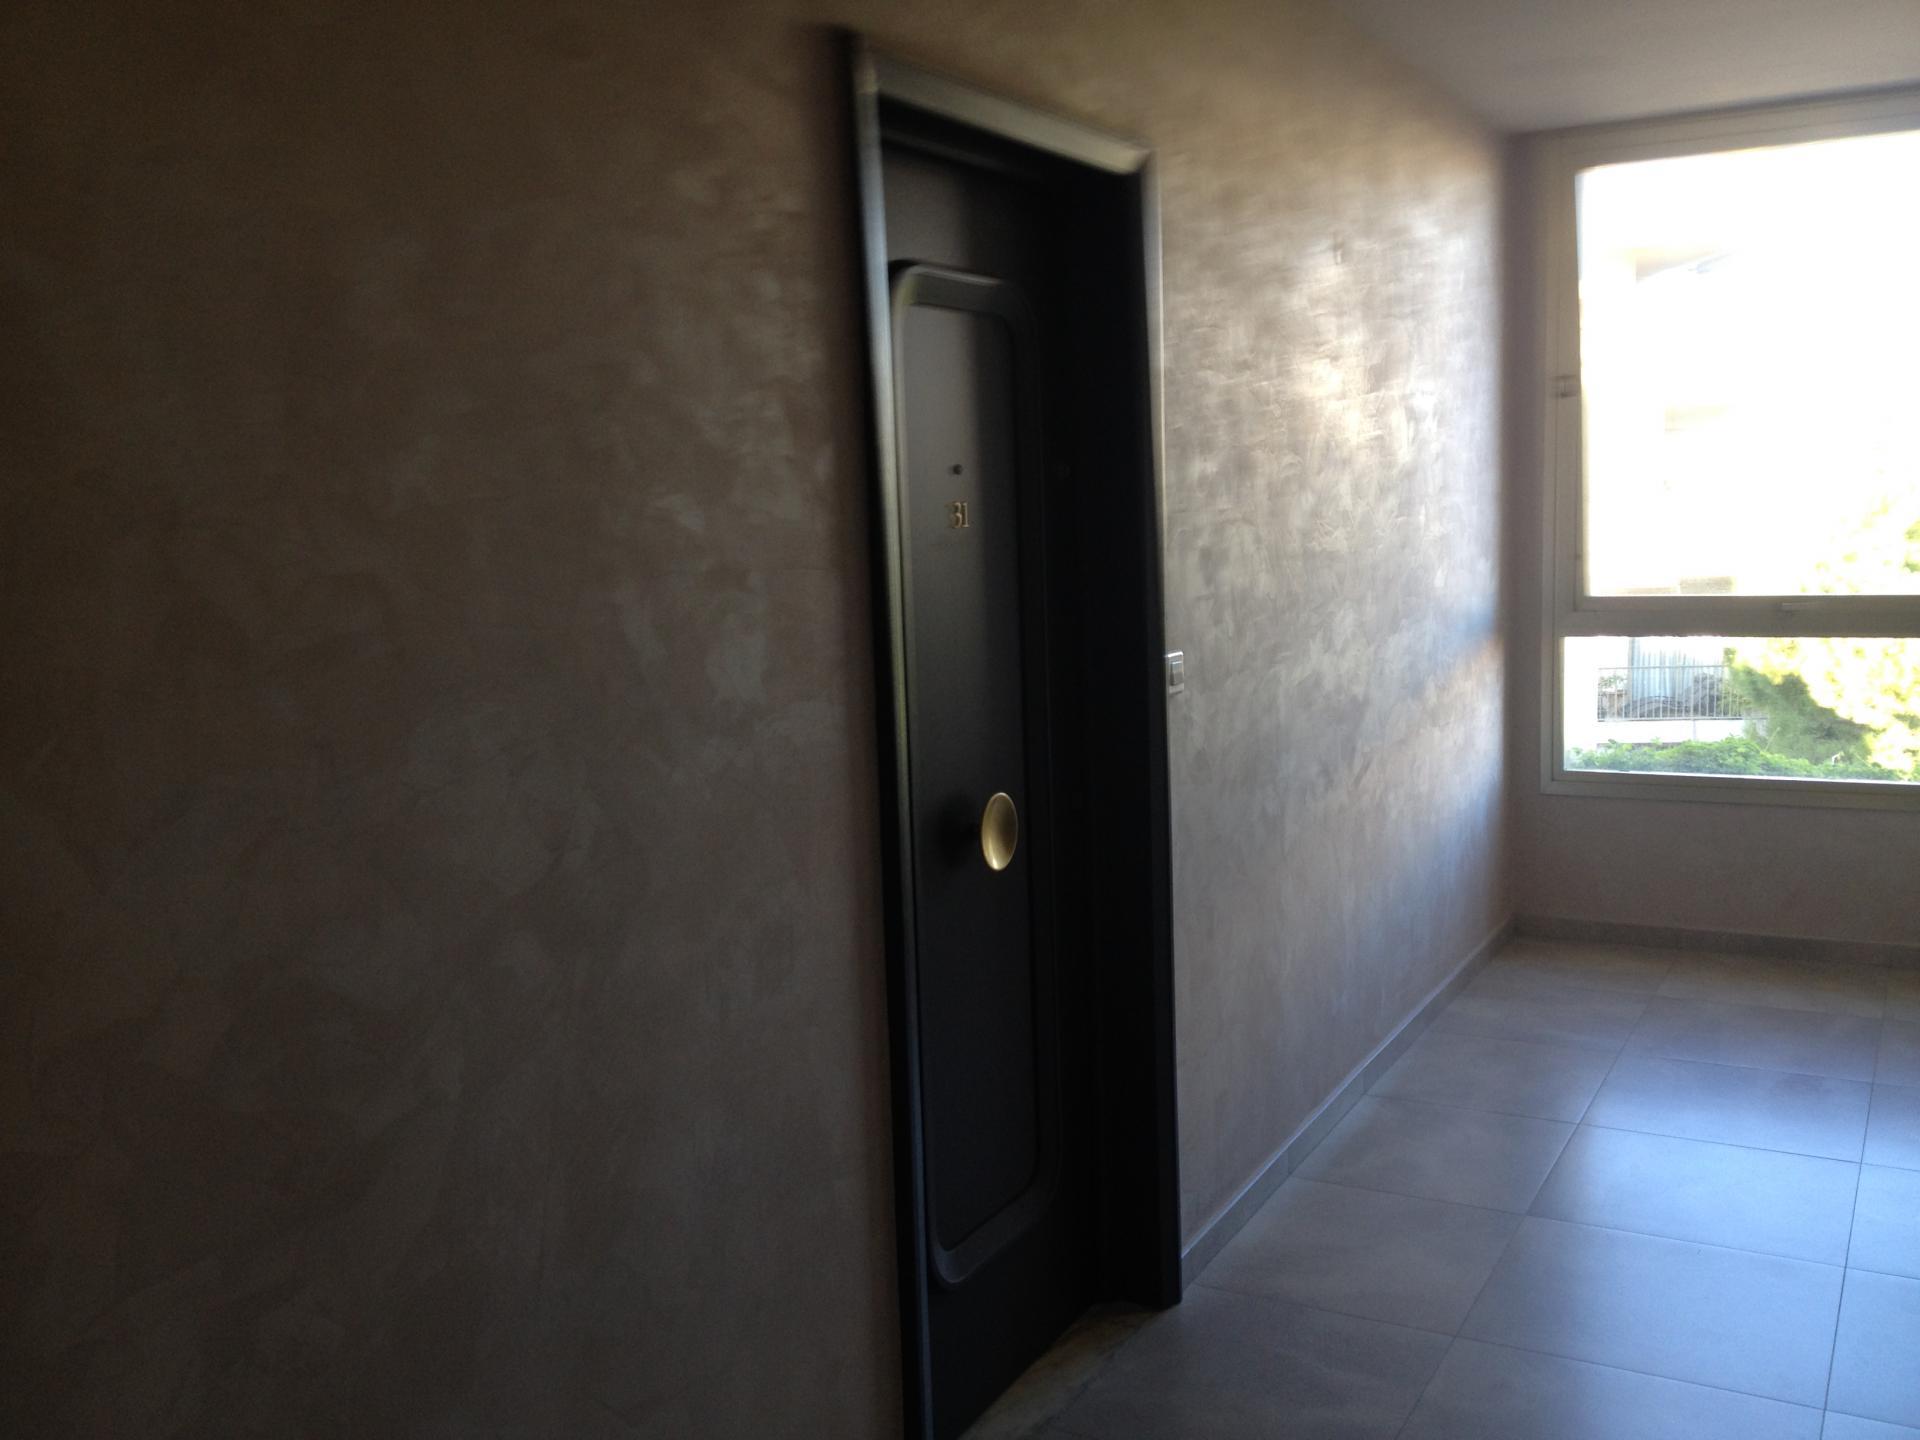 Seasonal rental Apartment - Saint-Laurent-du-Var